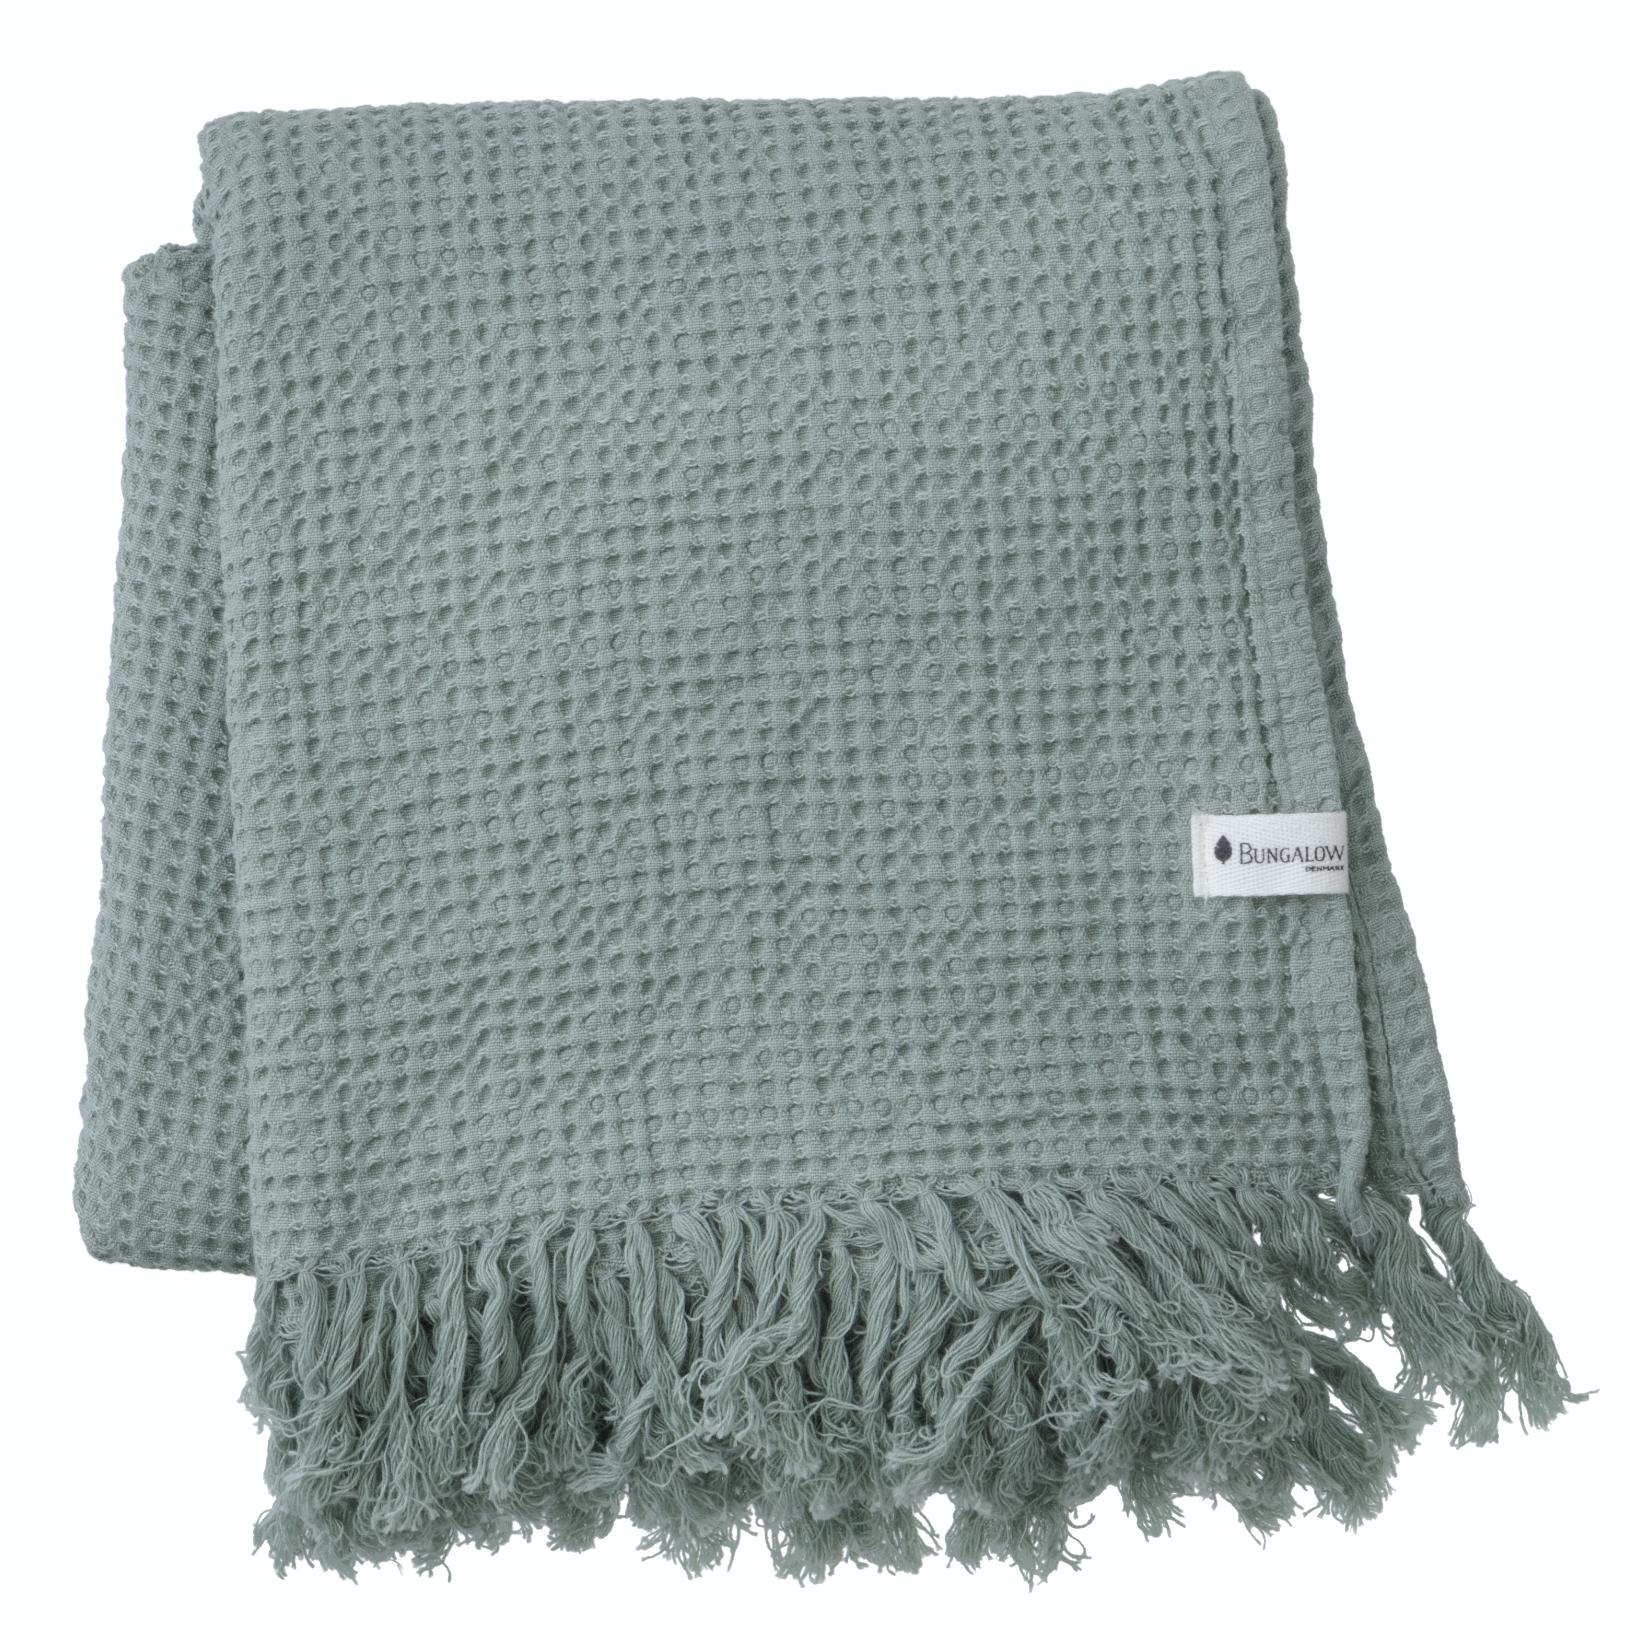 Waffly towel 120x70cm, Ivy